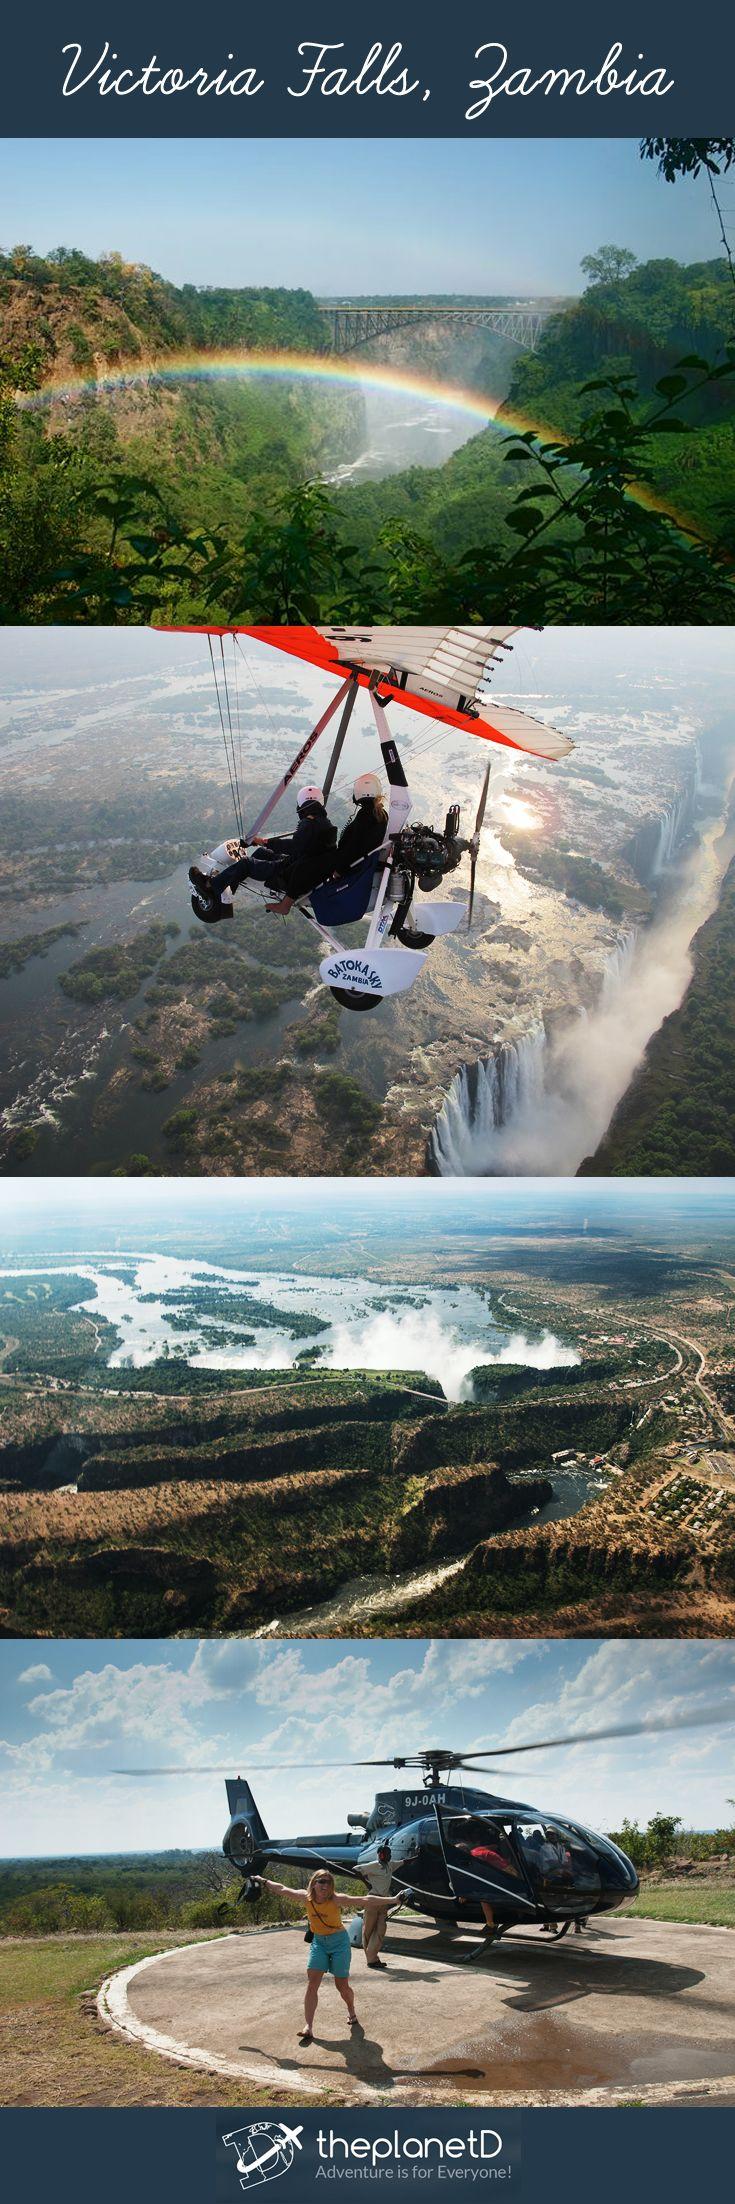 Dream Trip: Destination Victoria Falls, Zambia | The Planet D: Adventure Travel Blog